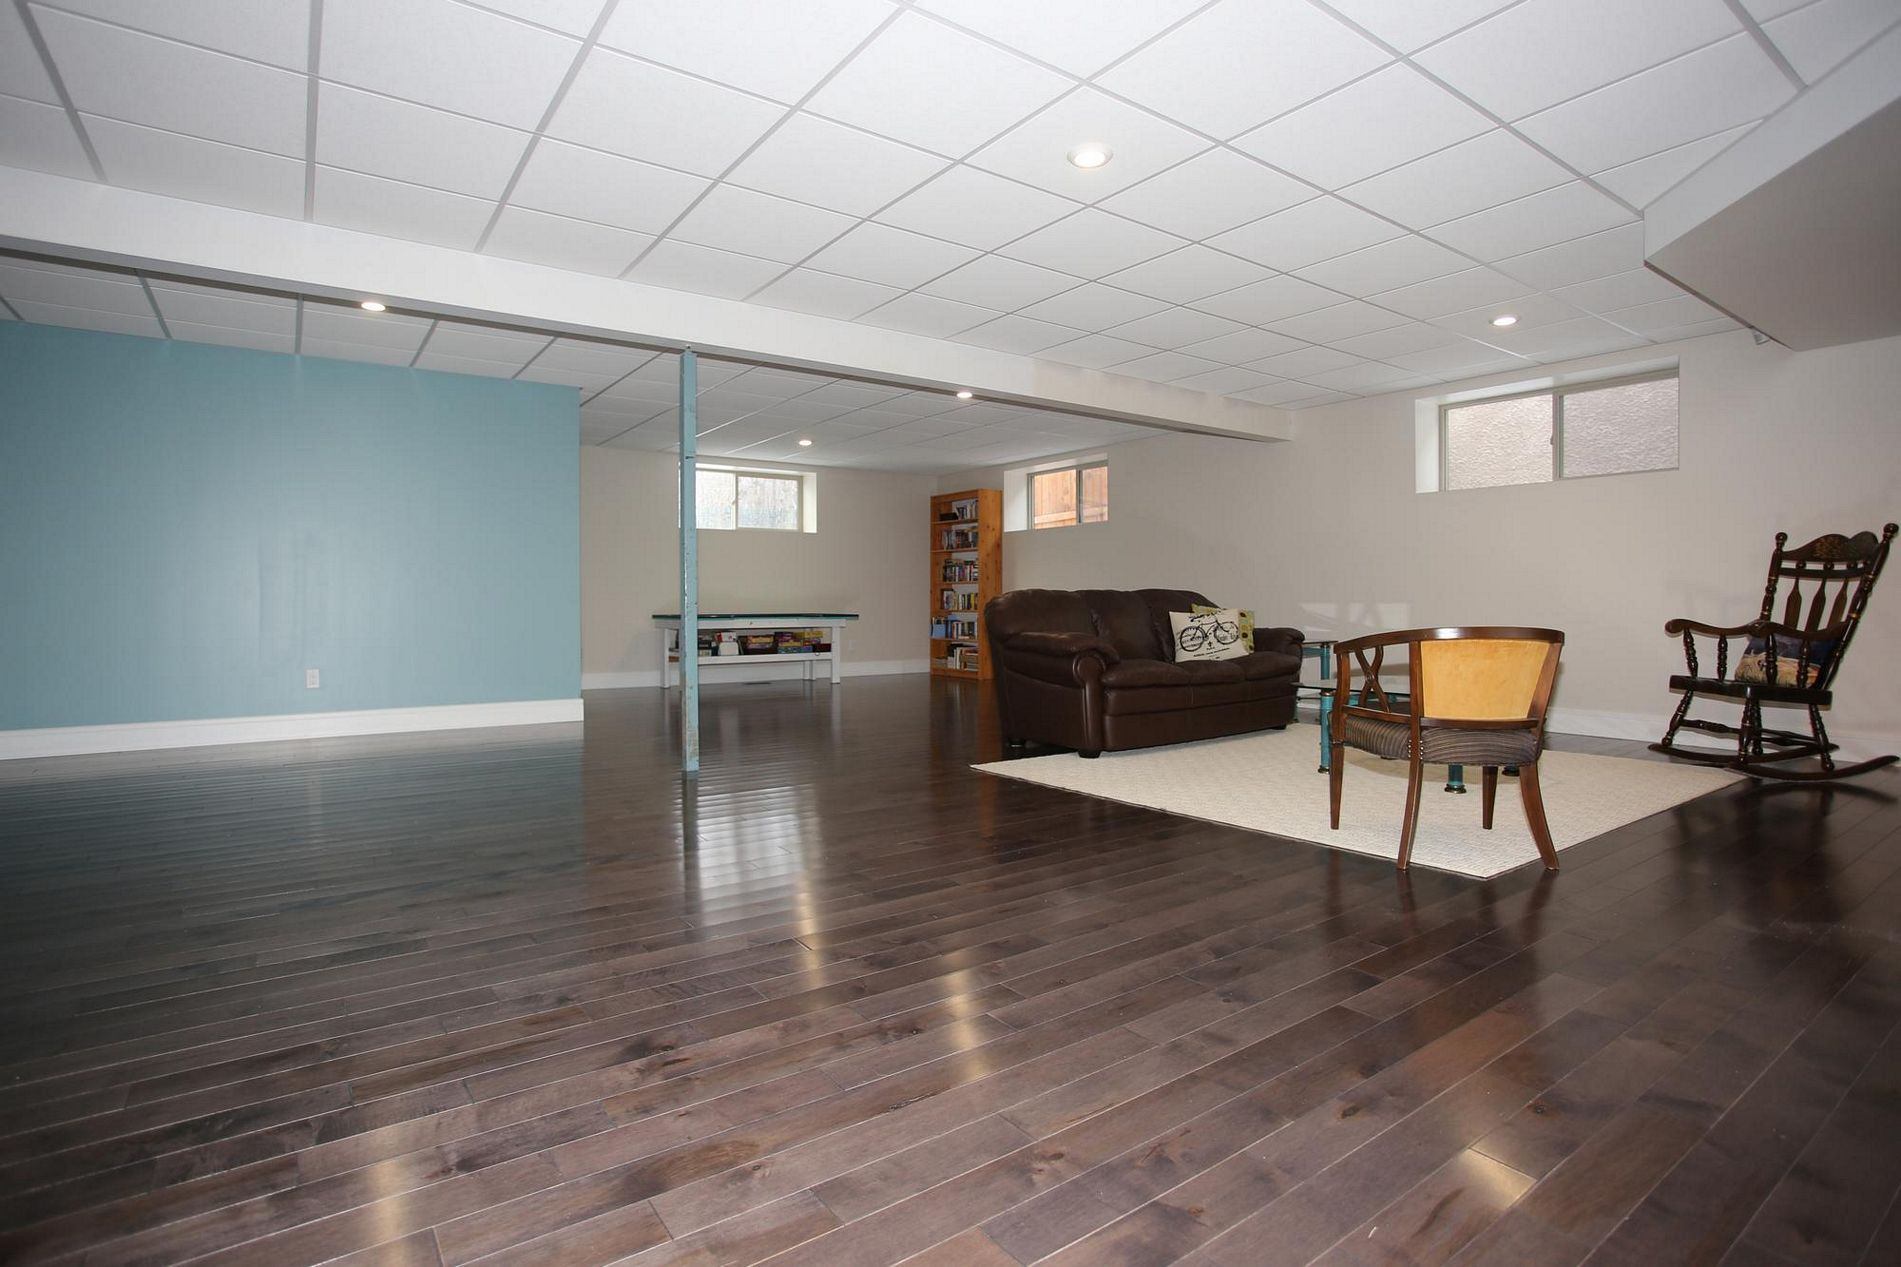 26 Edenwood Place, Winnipeg, Manitoba  R3X 0E4 - Photo 29 - 1831994